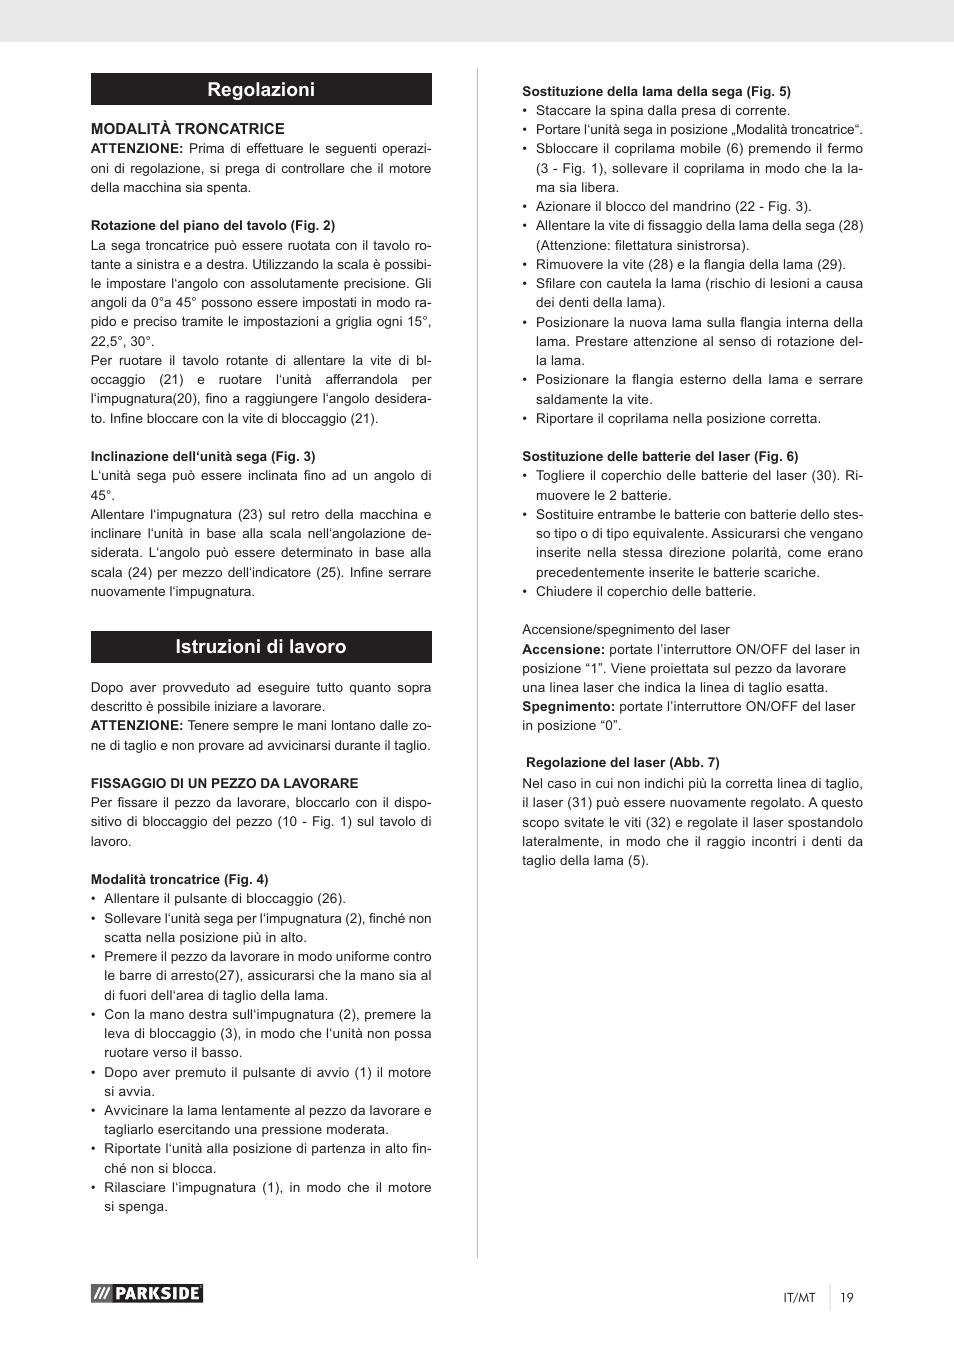 Regolazioni istruzioni di lavoro parkside pks 1500 a1 for Troncatrice parkside